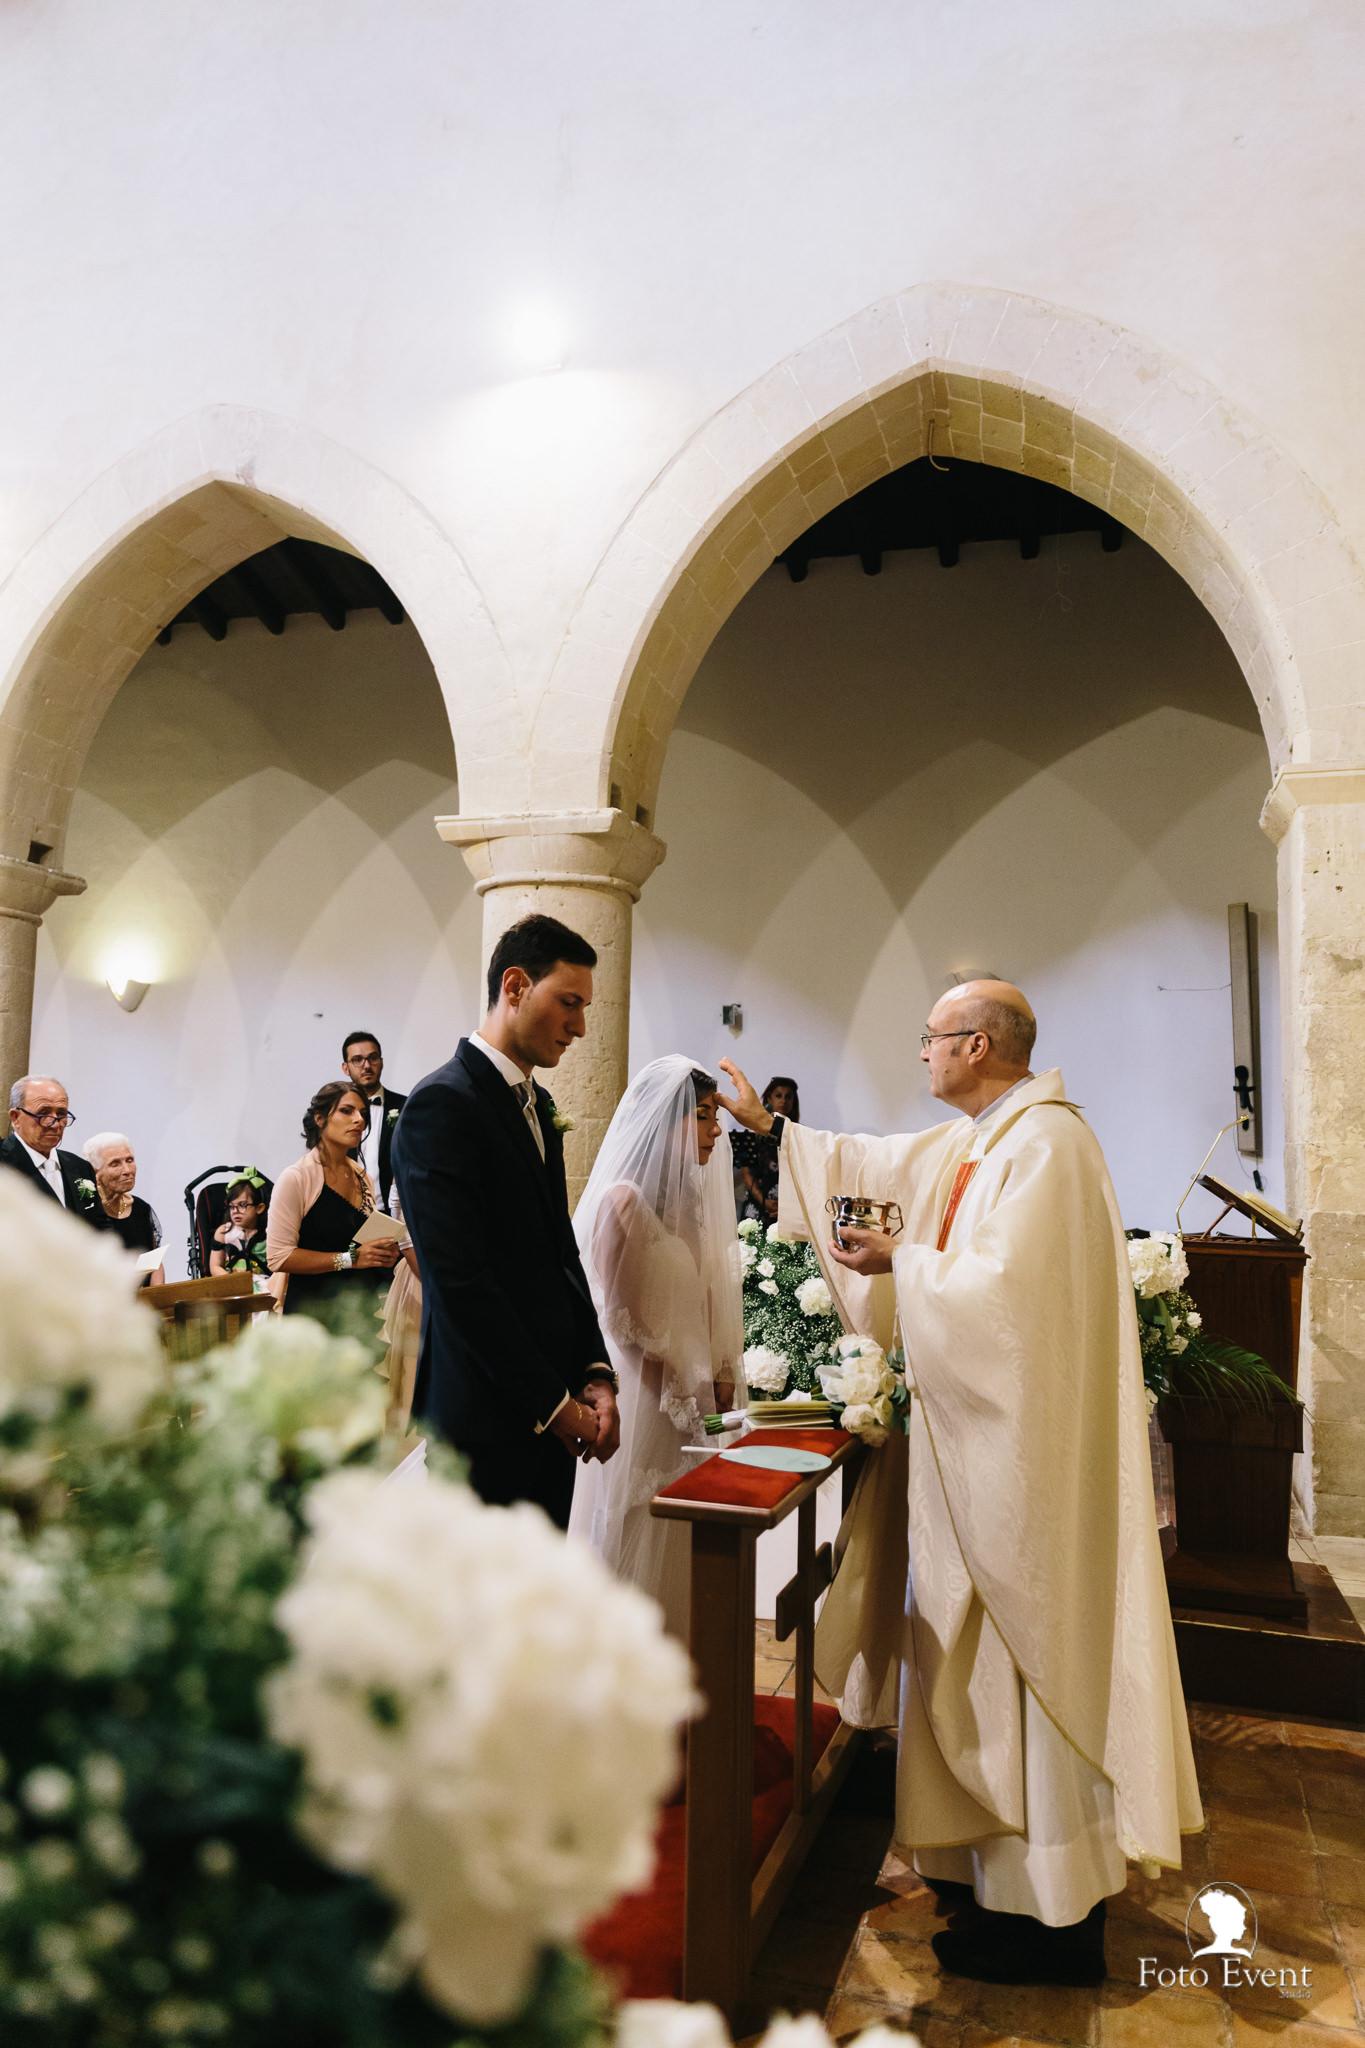 022-2019-08-23-Matrimonio-Lucia-e-Rosario-Scopelliti-5DE-1299